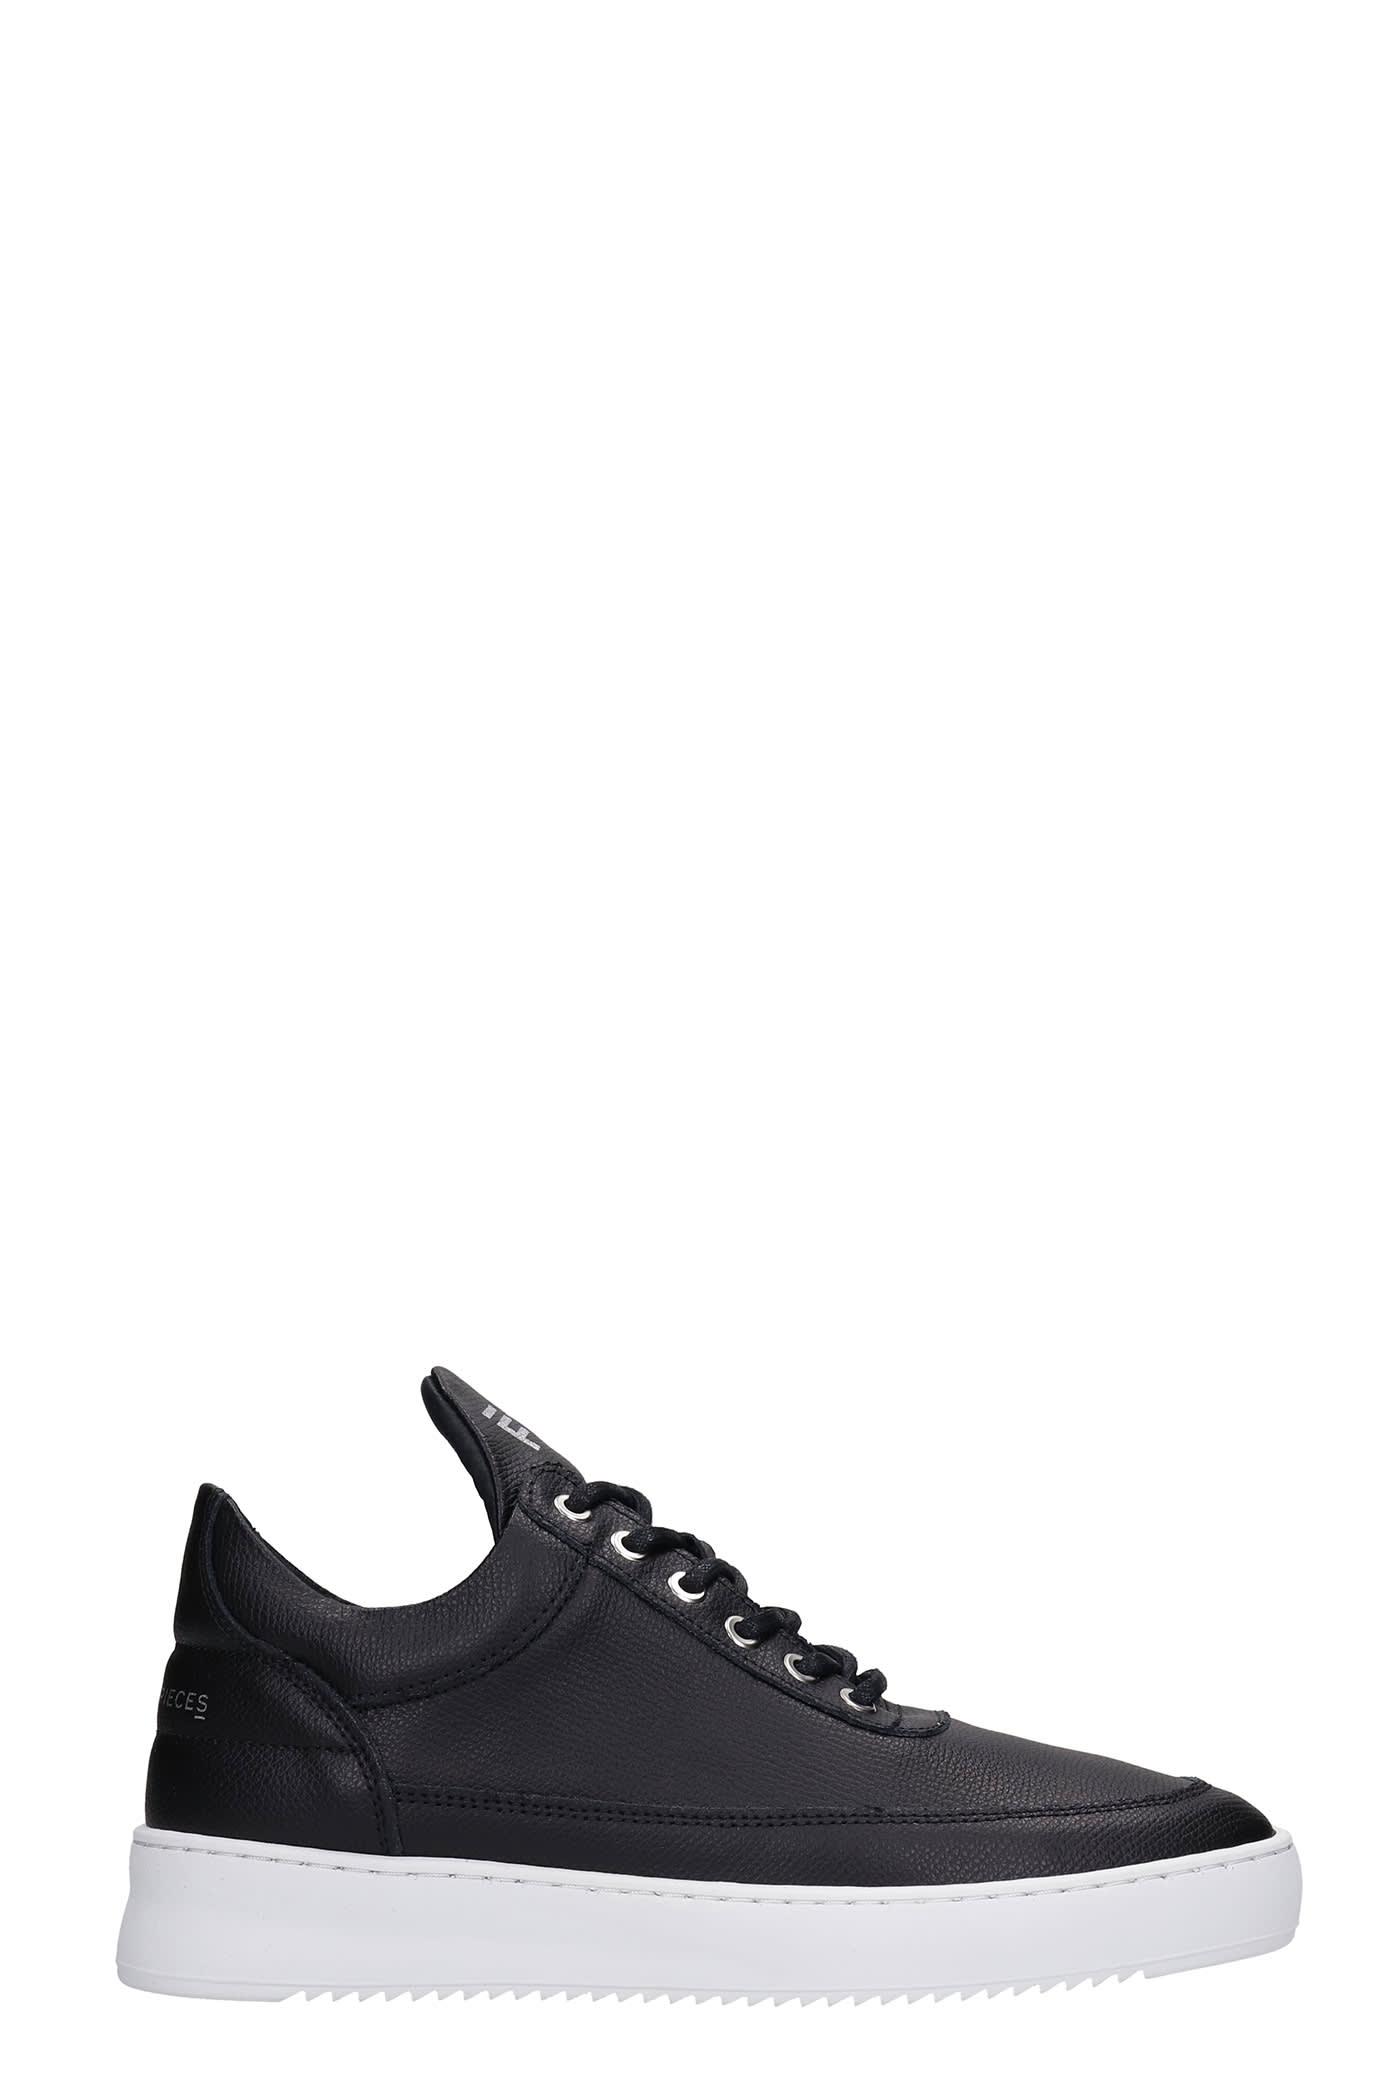 Low Top Ripple Sneakers In Black Leather